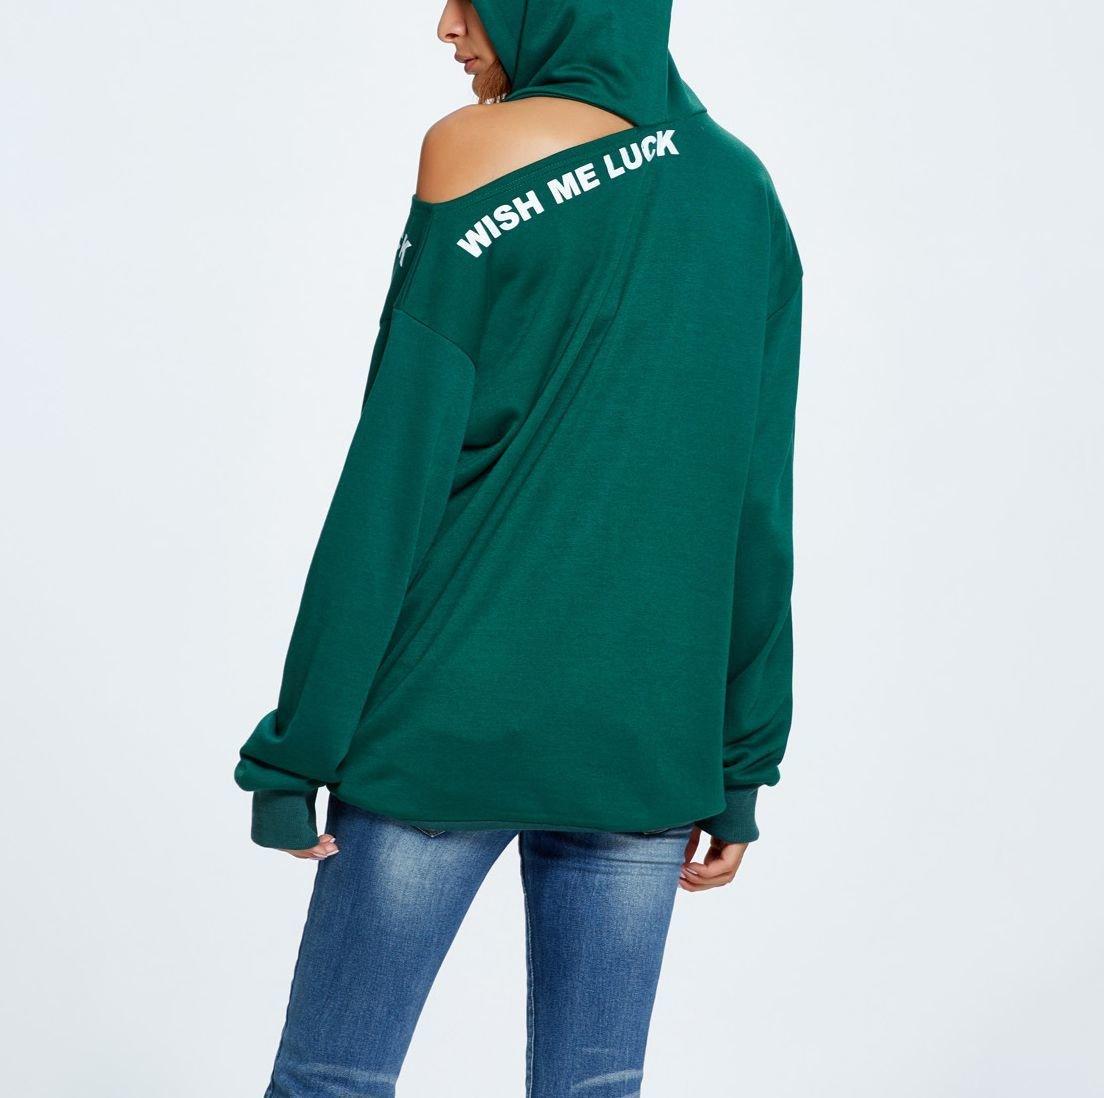 Hoodie Top with one Open Shoulder